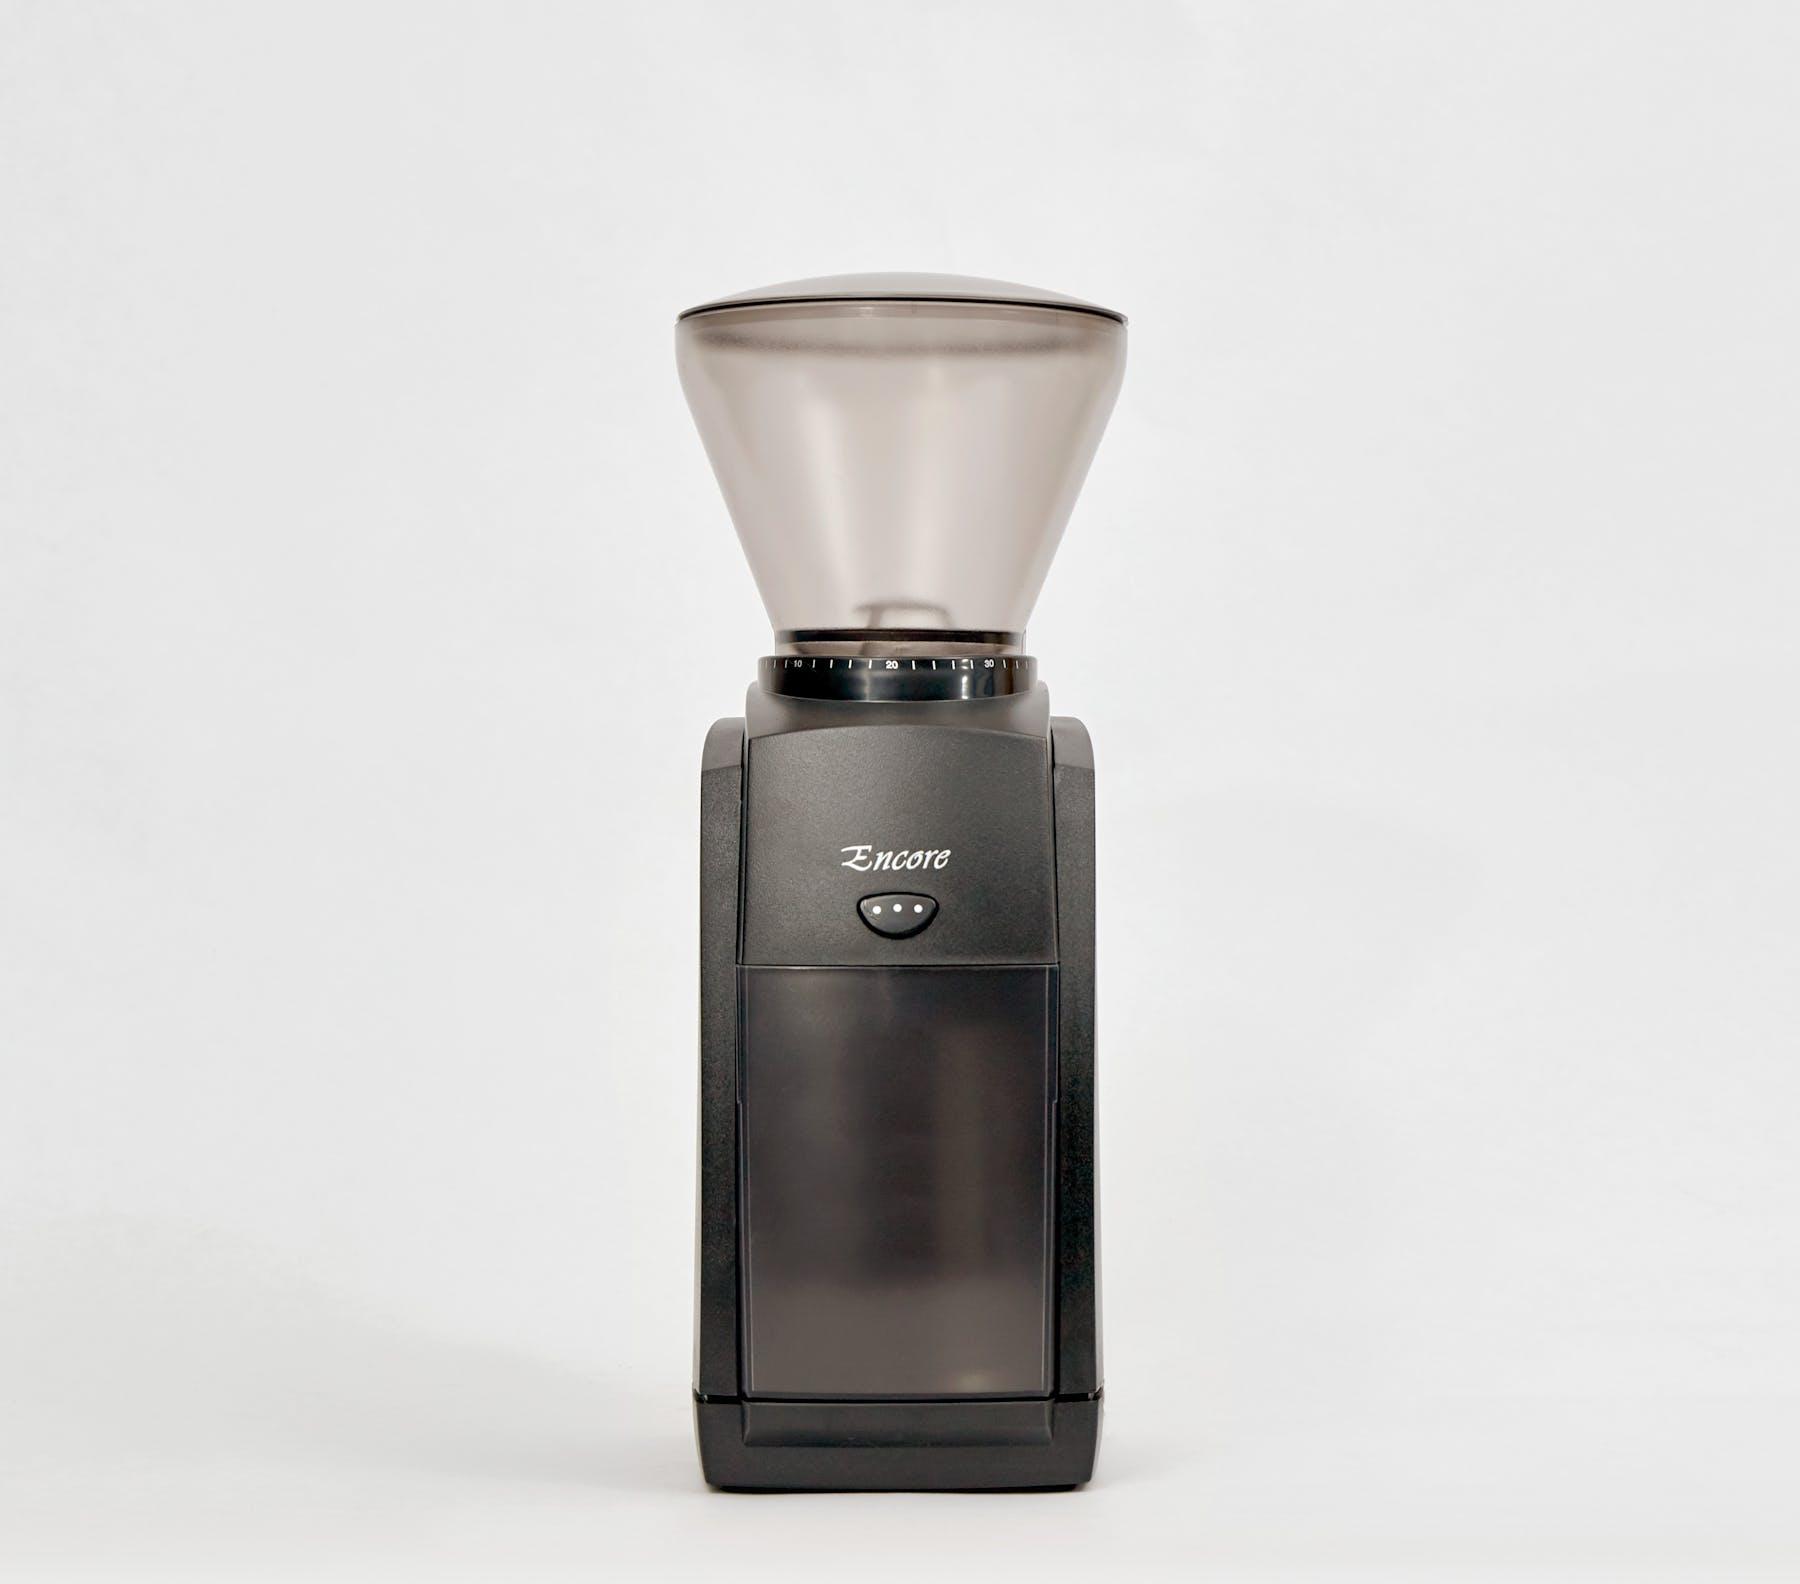 dispatch coffee baratza grinder 02